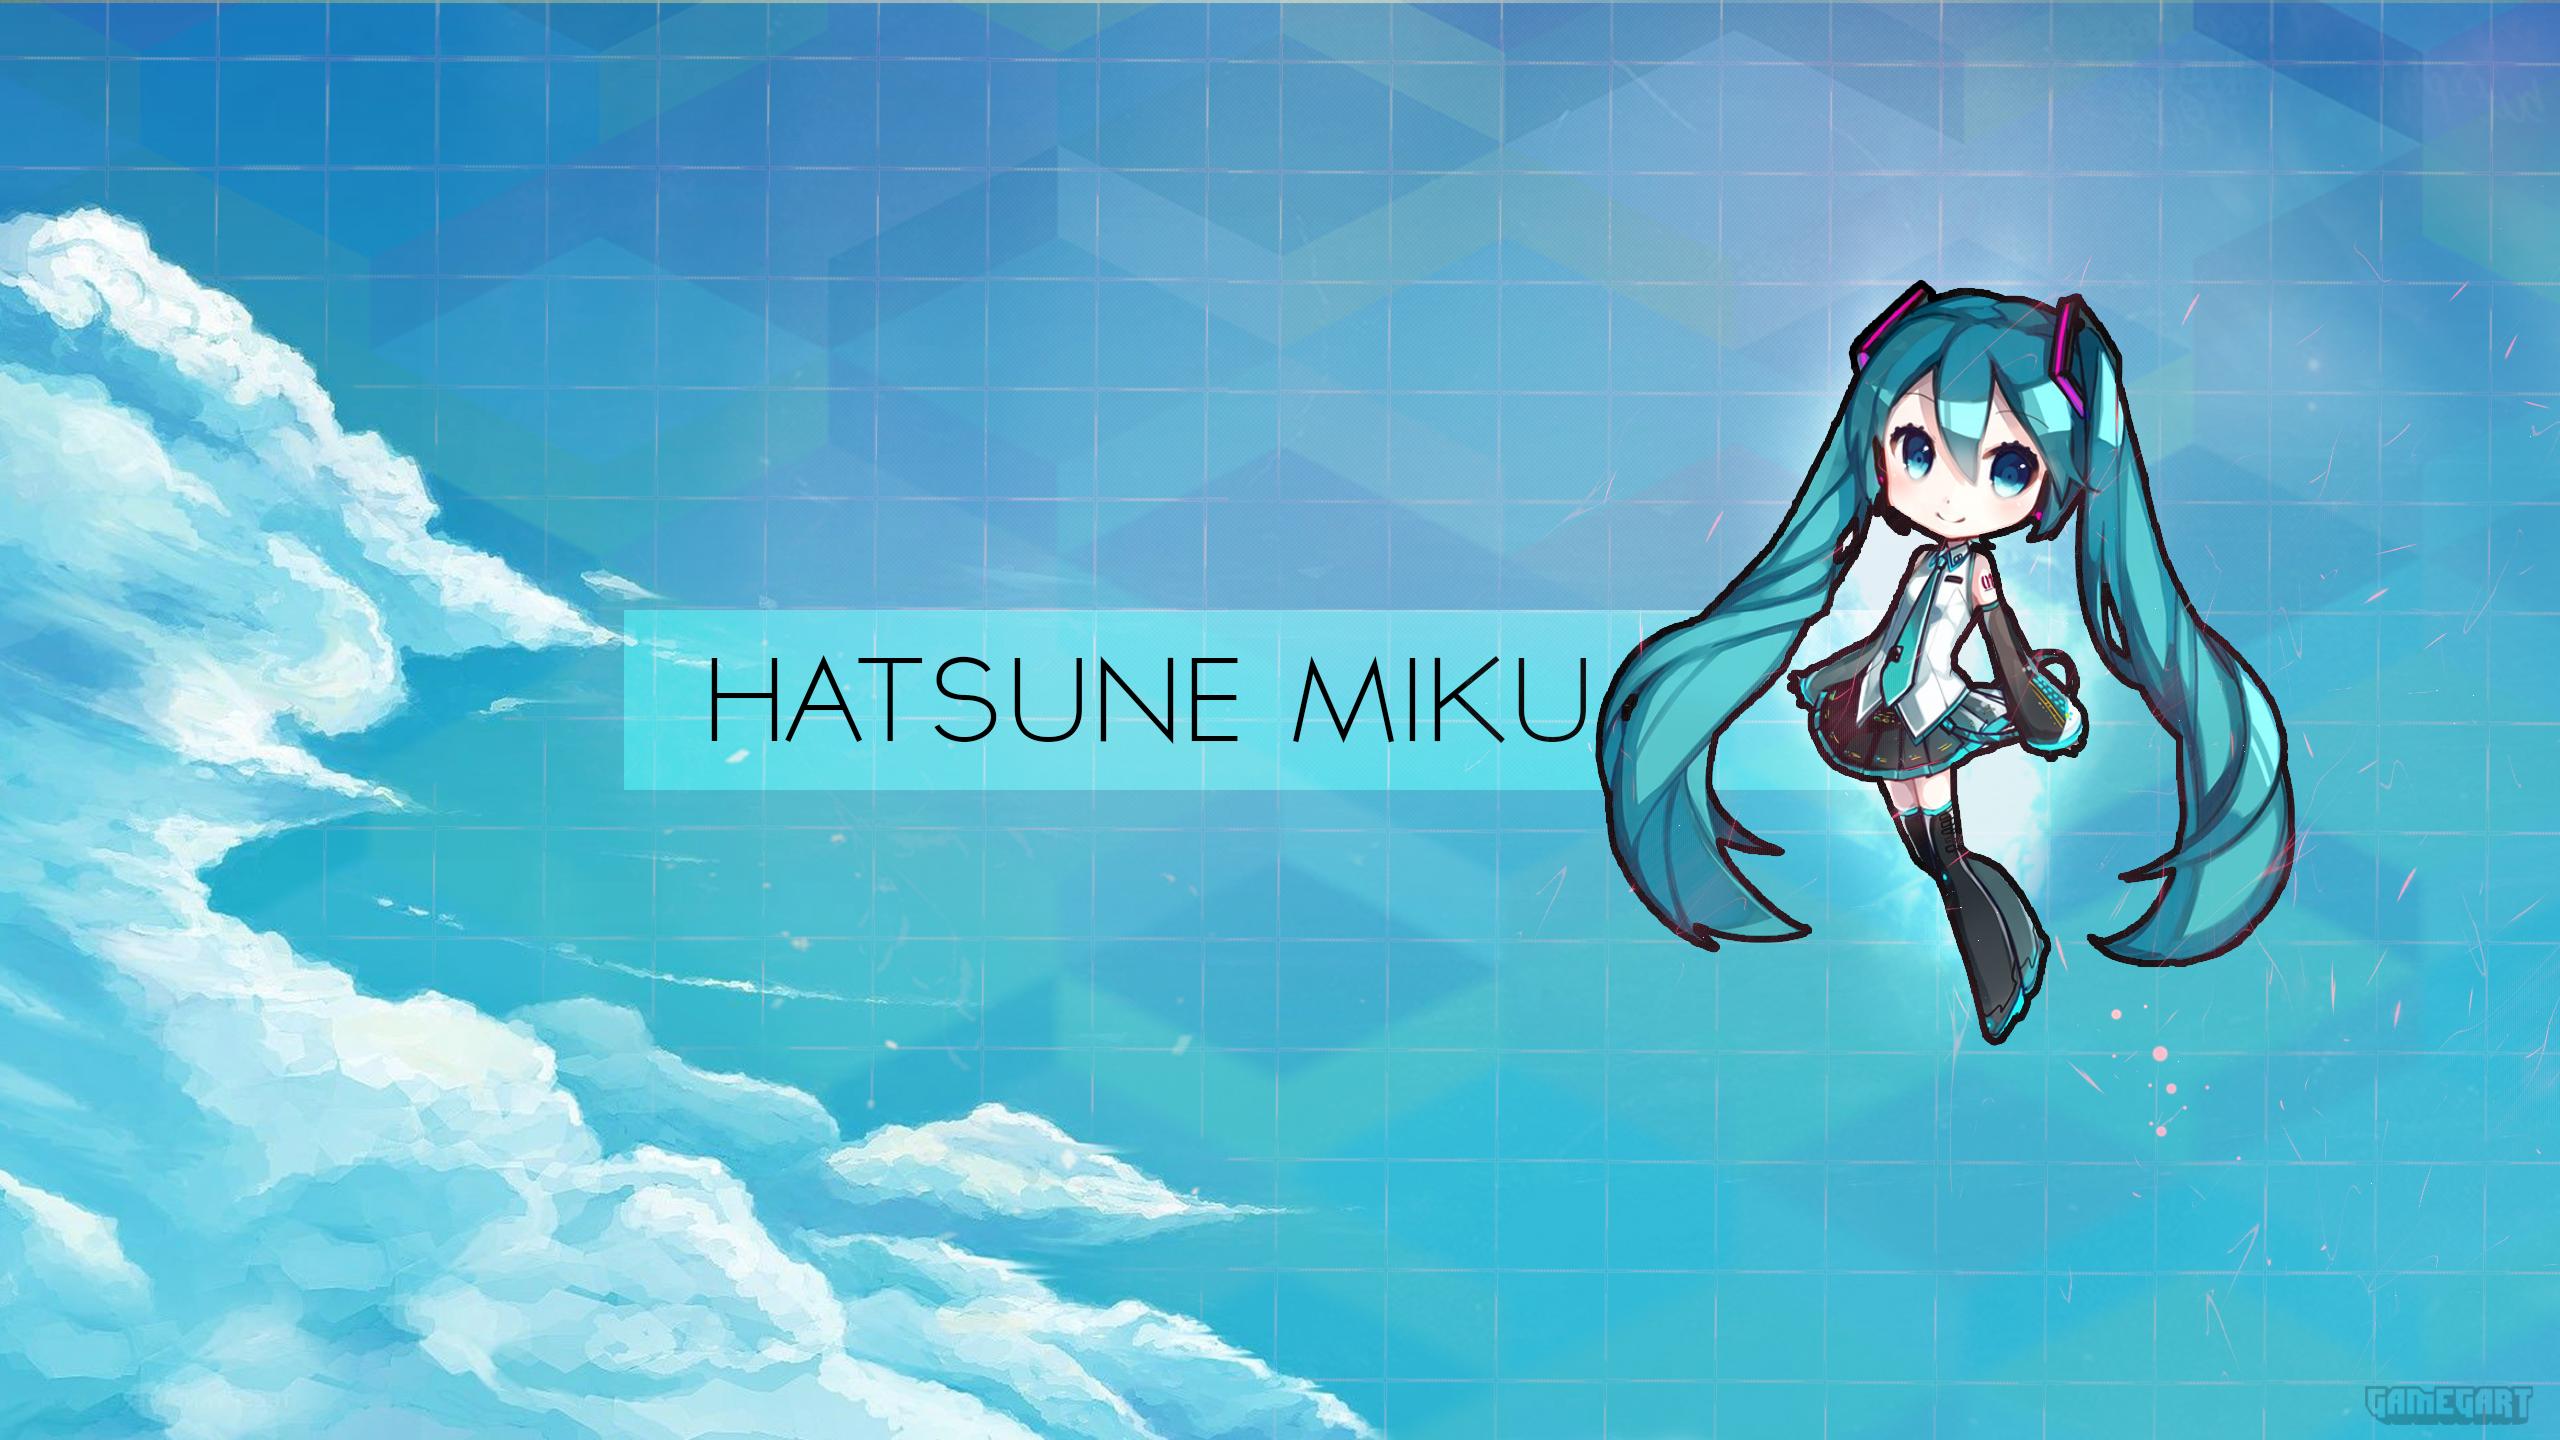 Chibi hatsune miku wallpaper fondo de pantalla hd fondo de escritorio 2560x1440 id 855034 - Chibi wallpaper hd ...